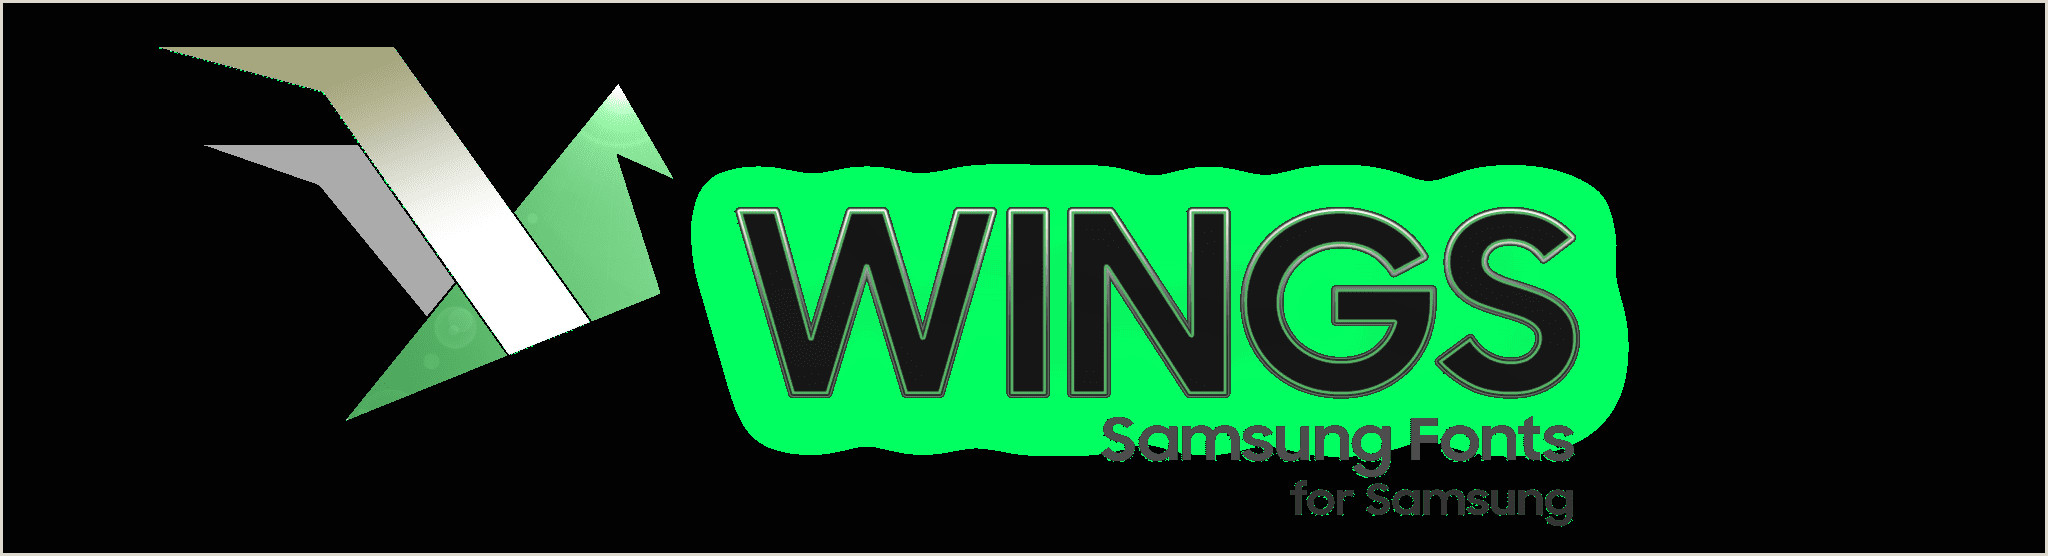 Custom Roll Up Banners Fonts] Wings Samsung Fonts V2 0d 1900 N…